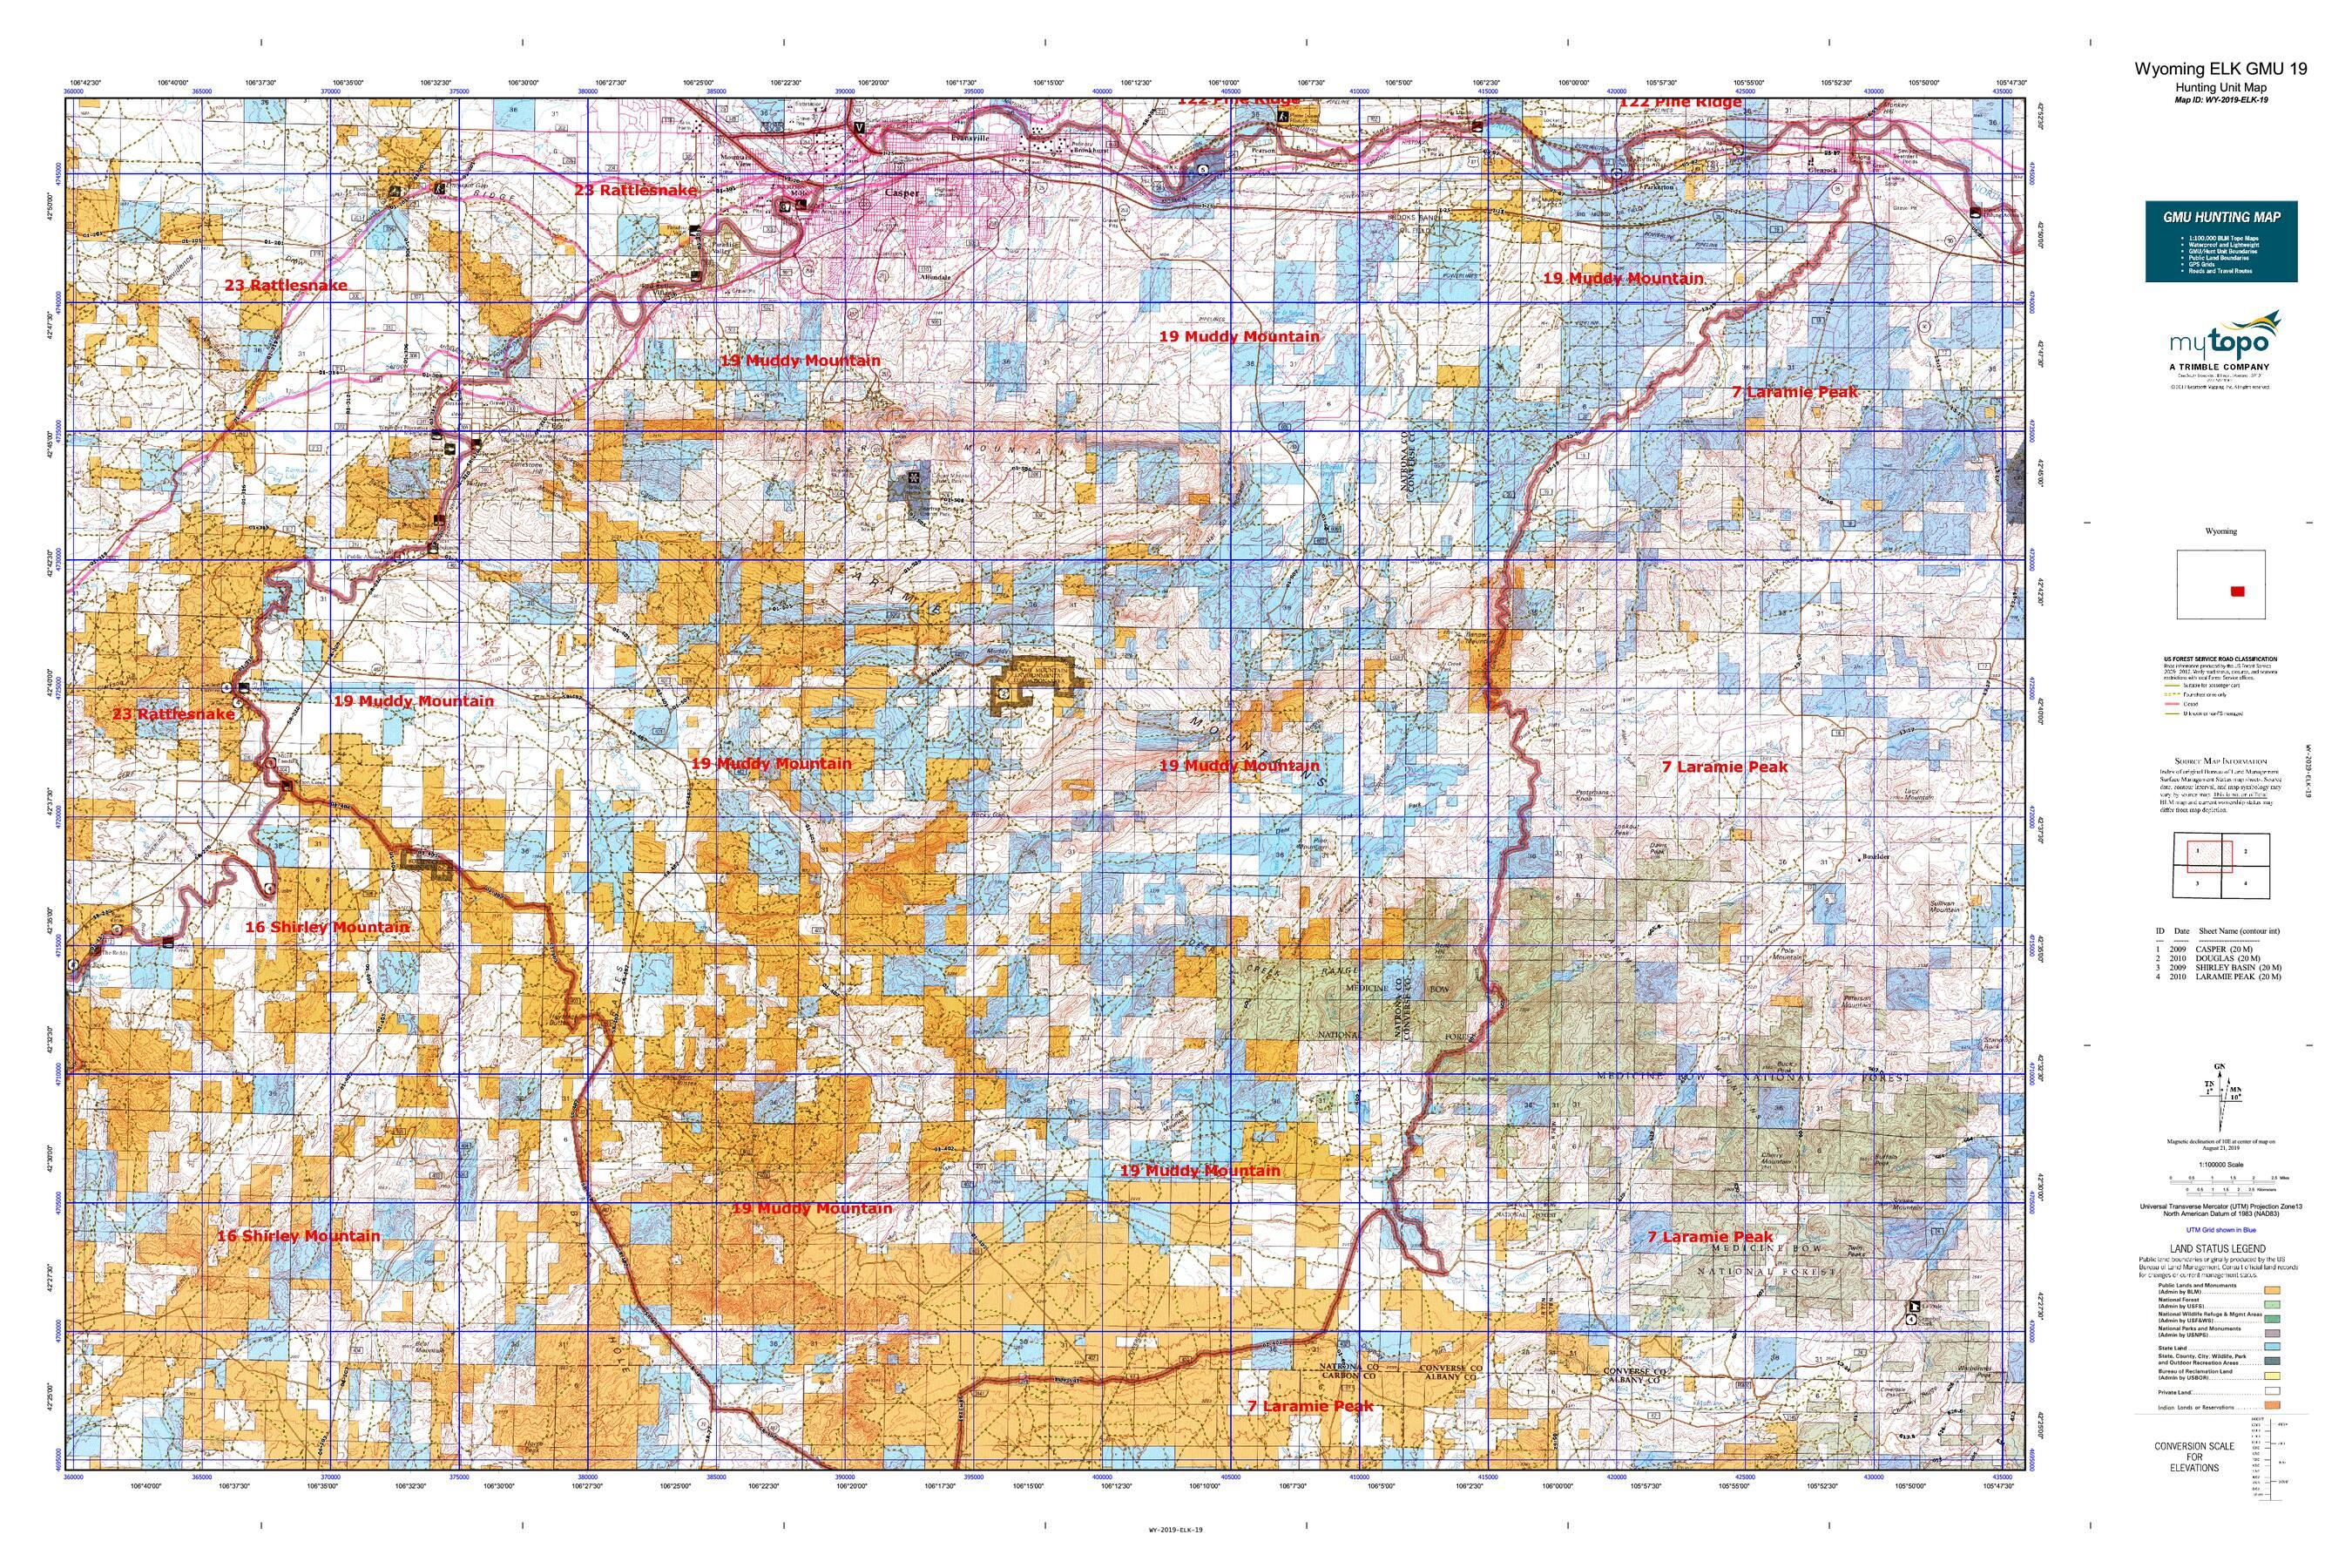 Wyoming ELK GMU 19 Map | MyTopo